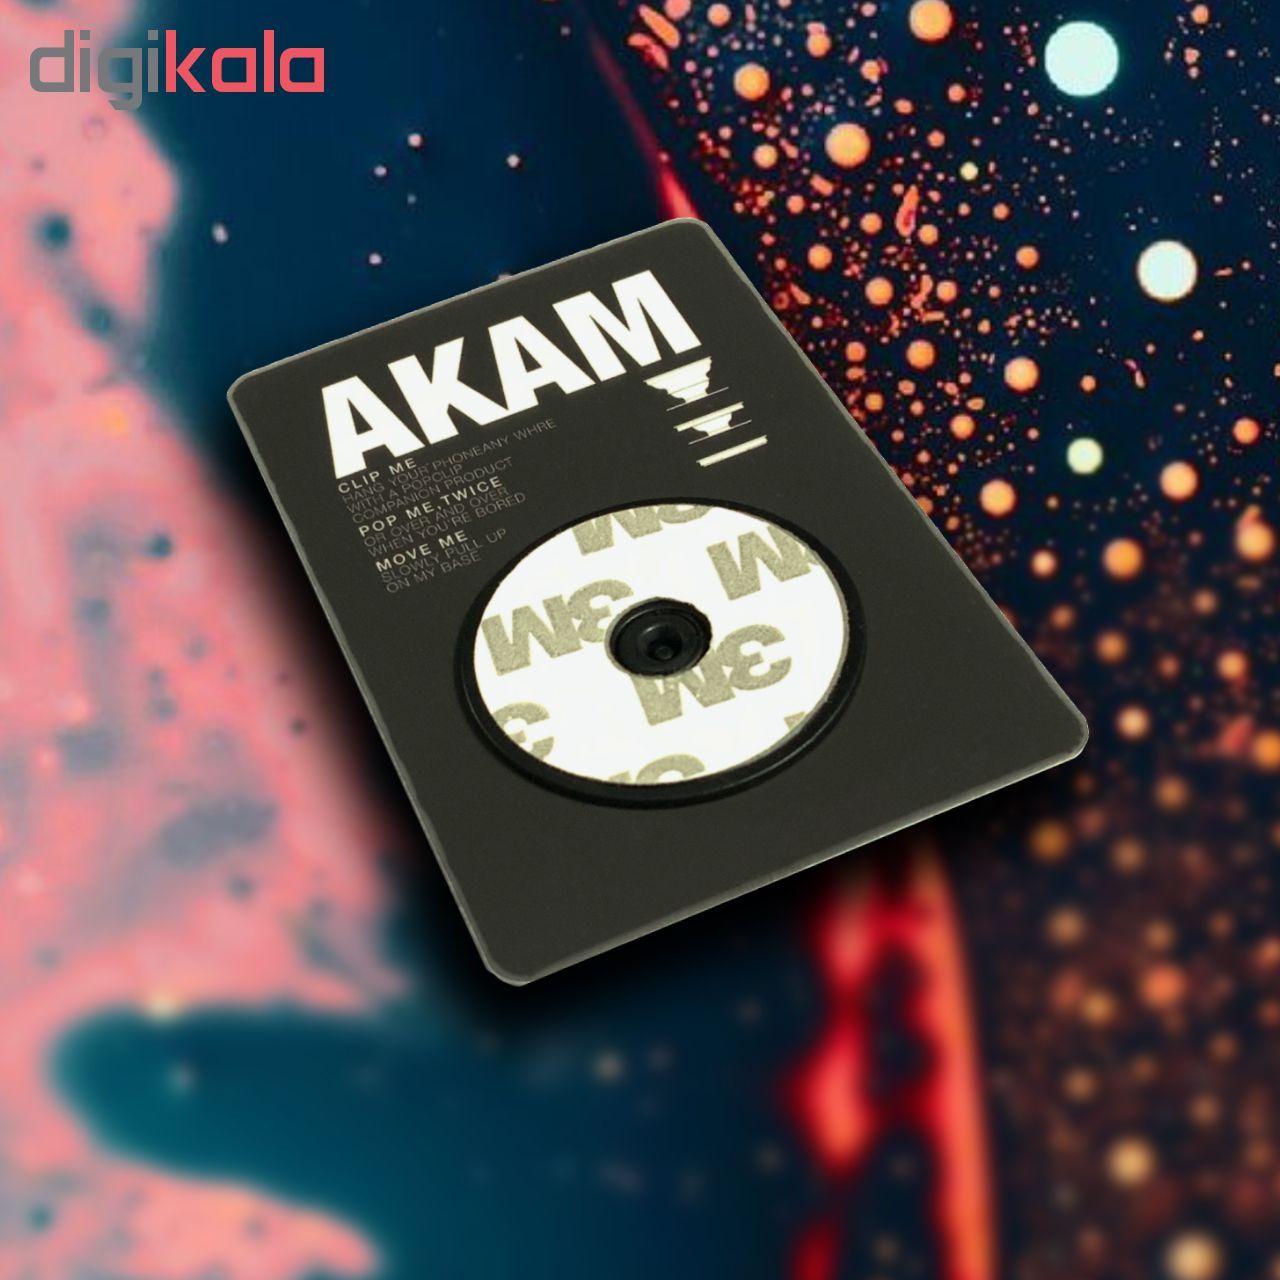 پایه نگهدارنده گوشی موبایل پاپ سوکت آکام مدل APS0021 main 1 3